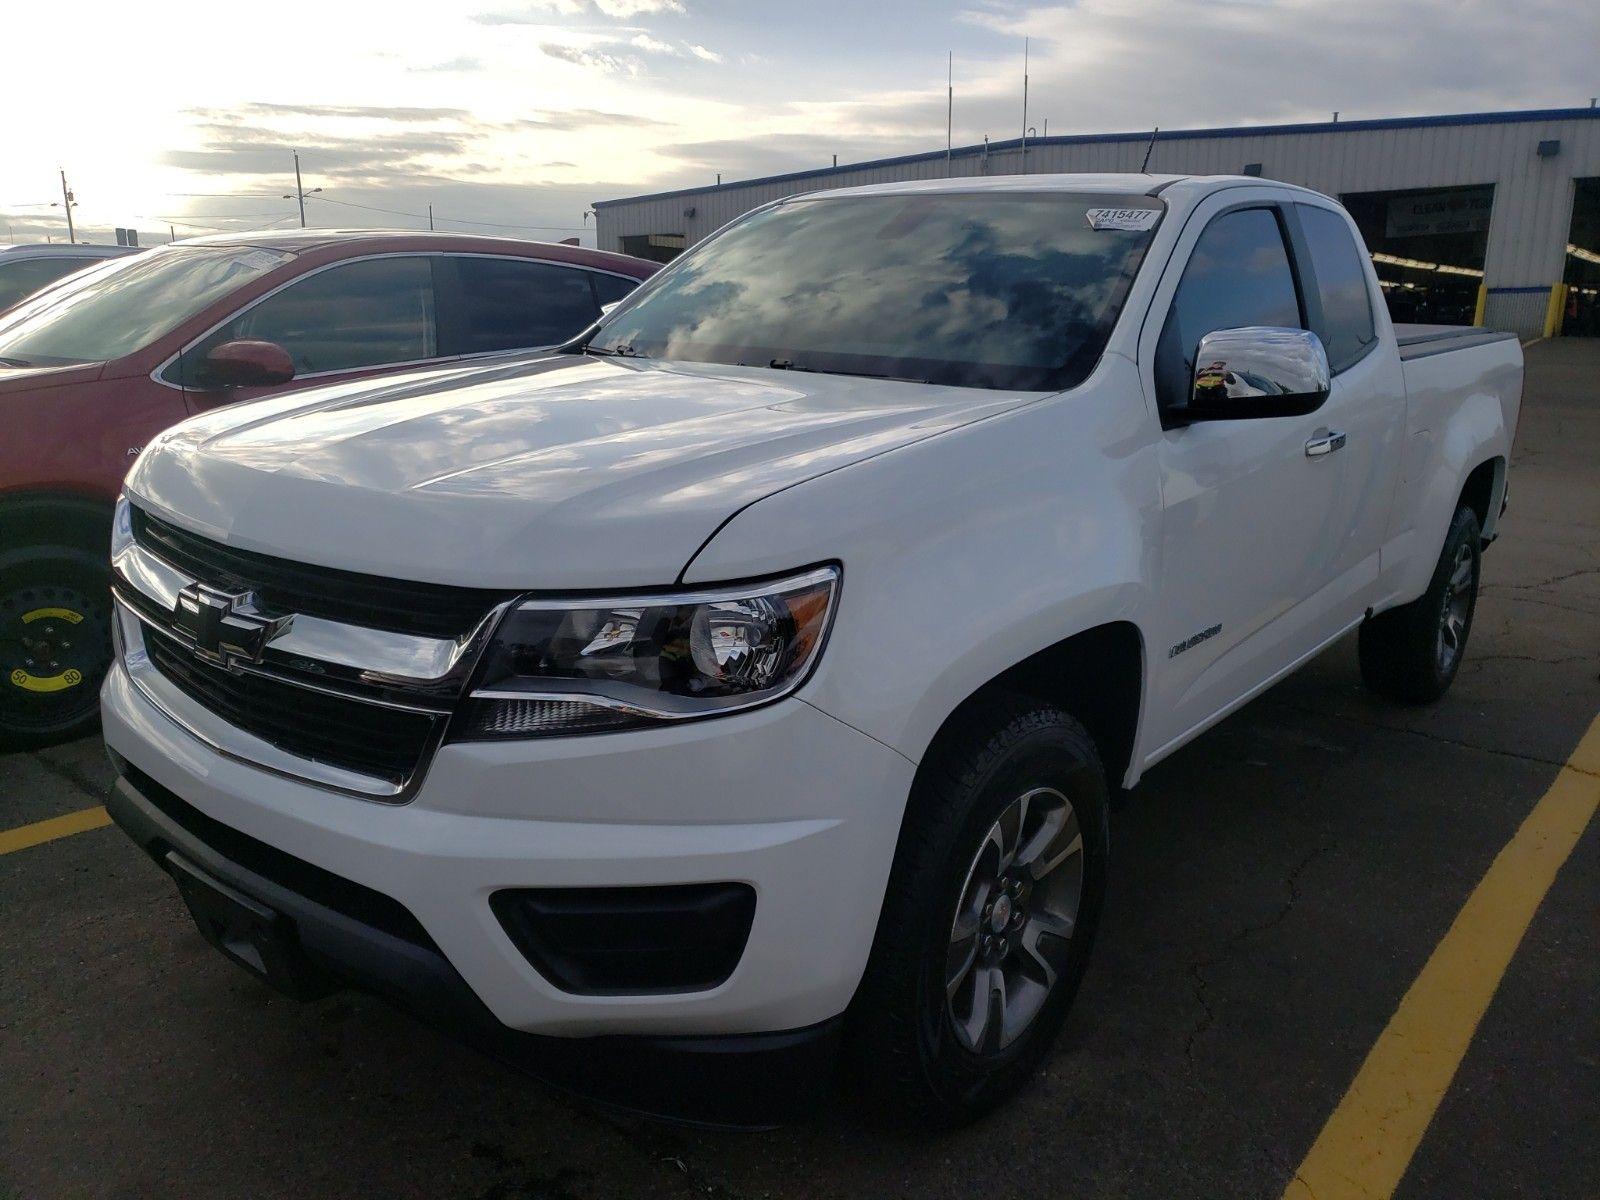 2016 Chevrolet Colorado 2.5. Lot 99914679271 Vin 1GCHSBEA8G1329933